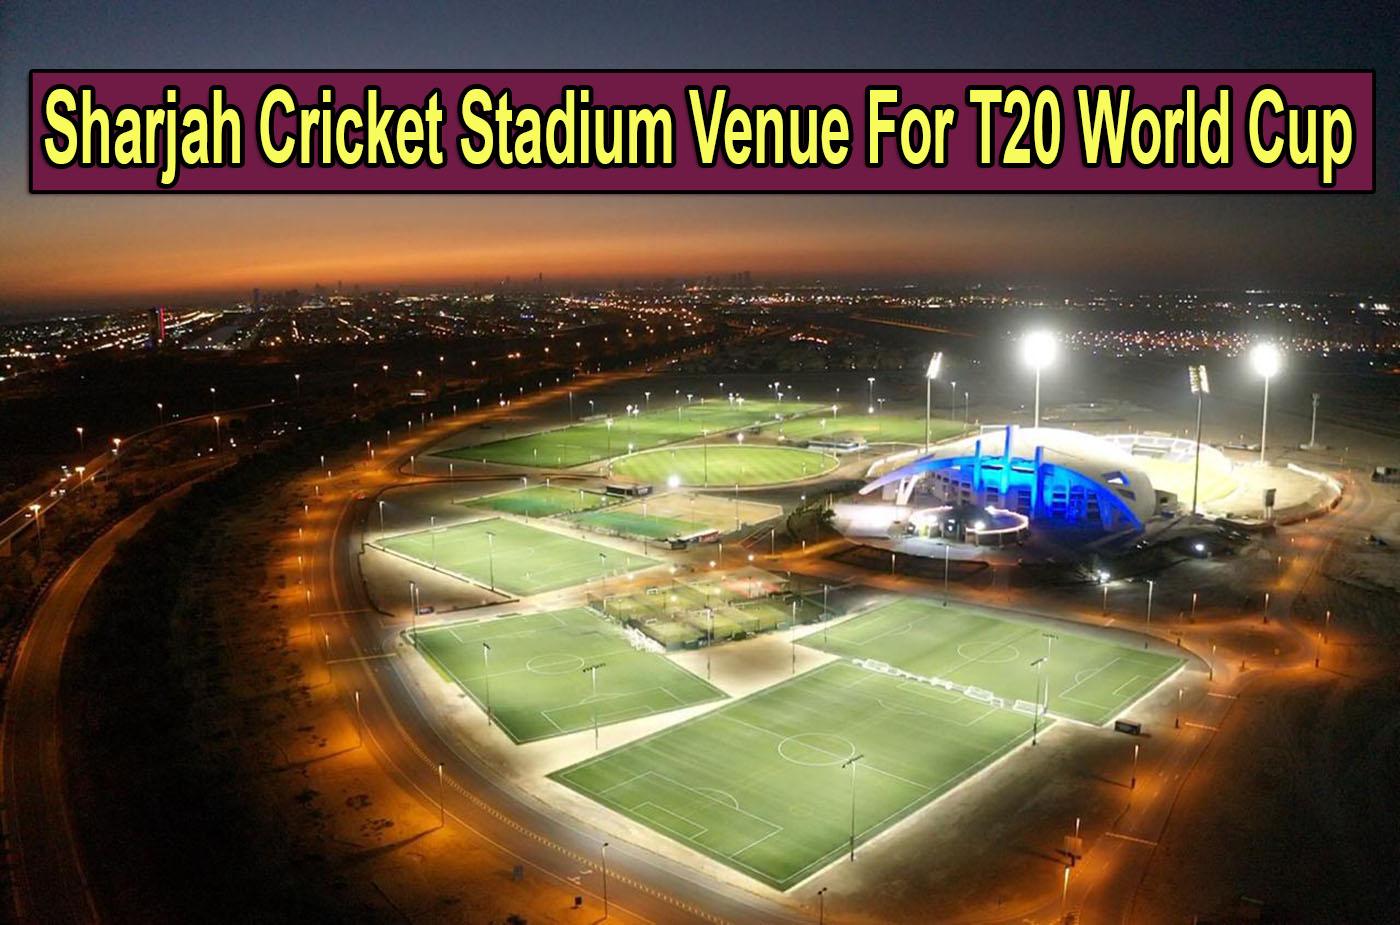 Sharjah Cricket Stadium Venue For T20 World Cup 2021